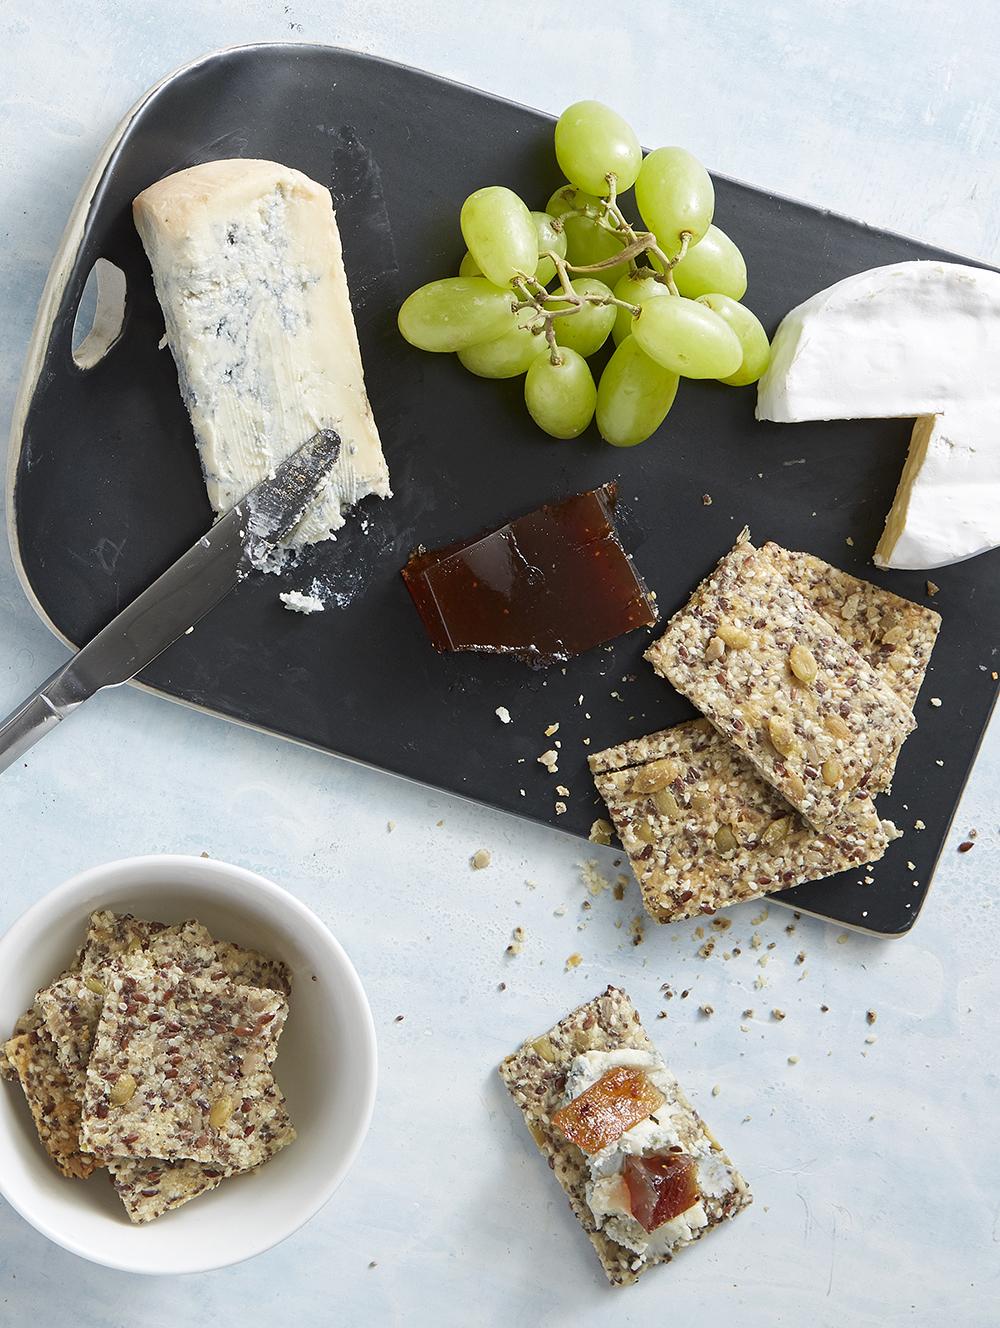 FL-parmesan-seed-cracker-sml.jpg